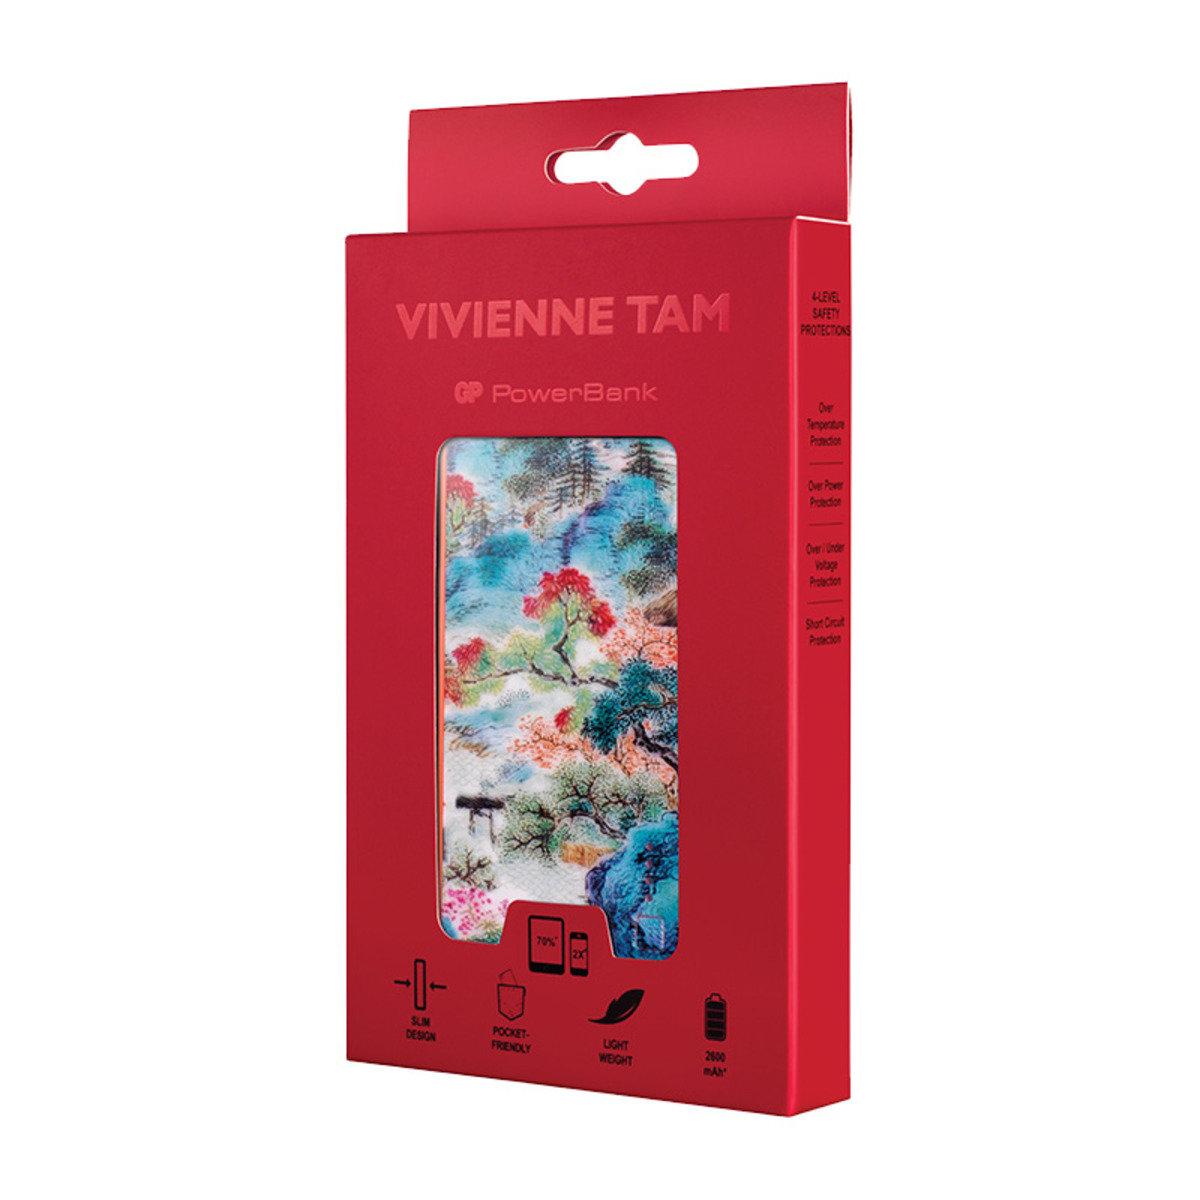 Vivienne Tam x GP限量版儲電寶352PB 5200mAh - 亭台樓閣